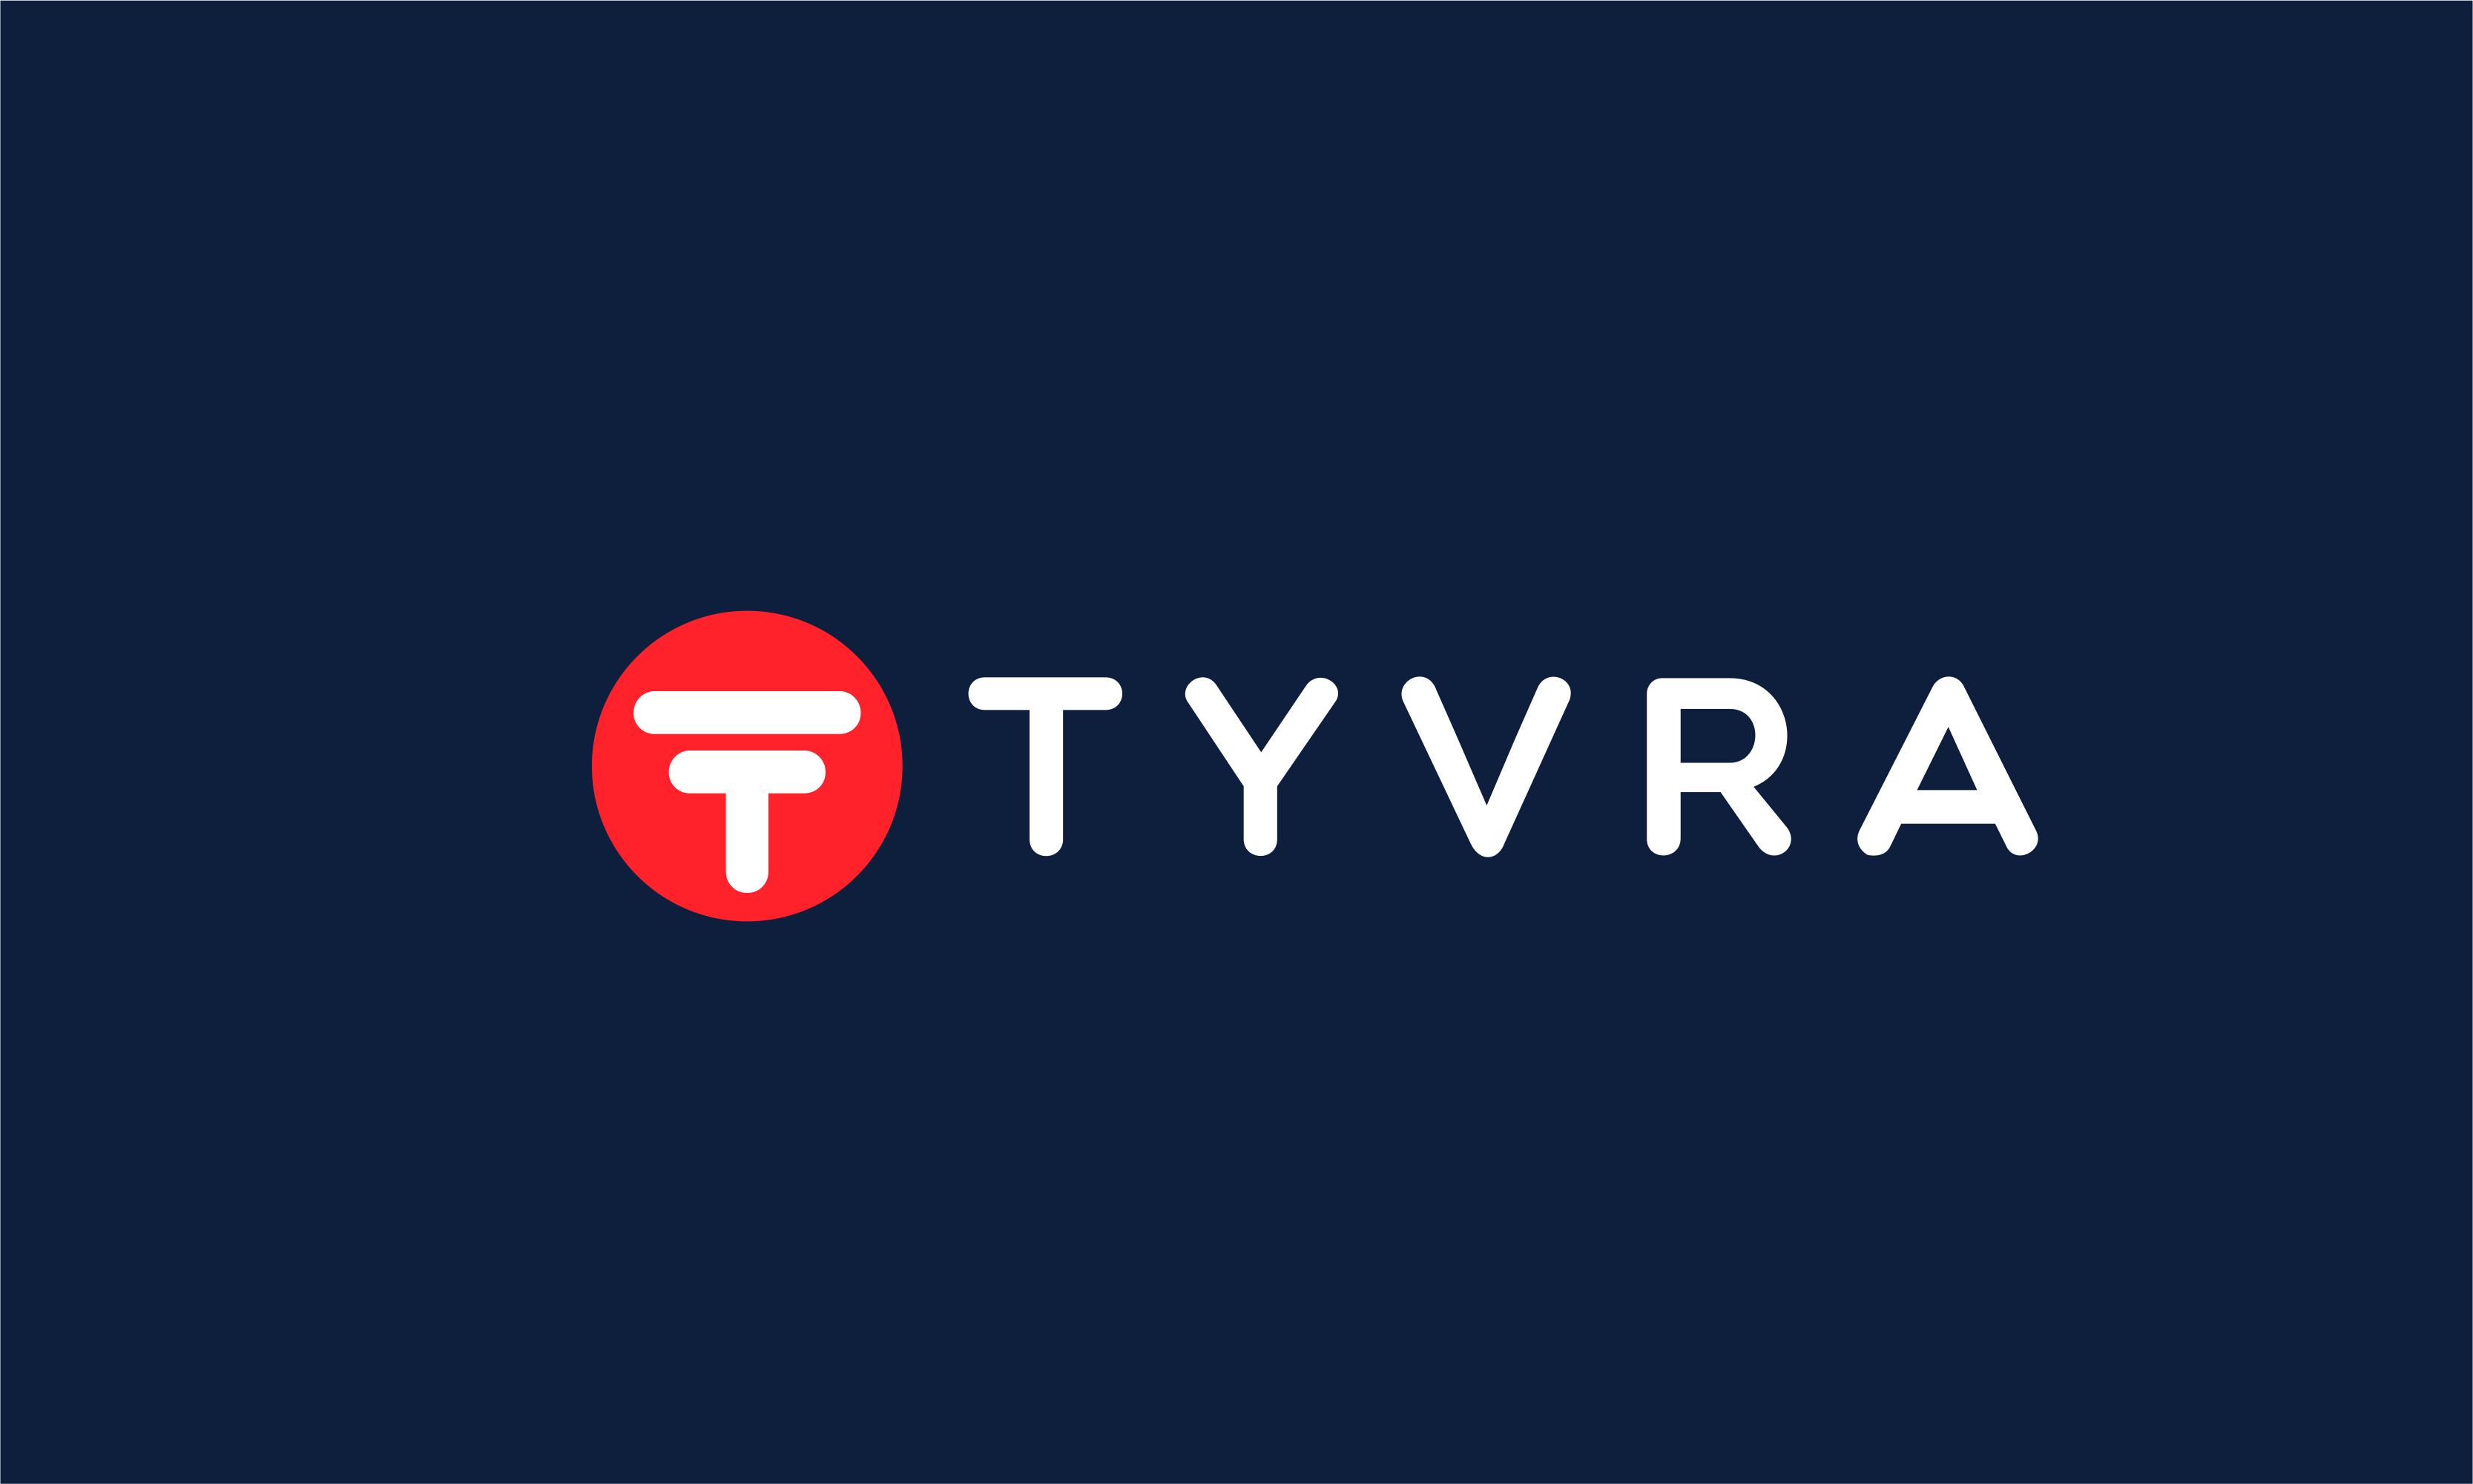 Tyvra